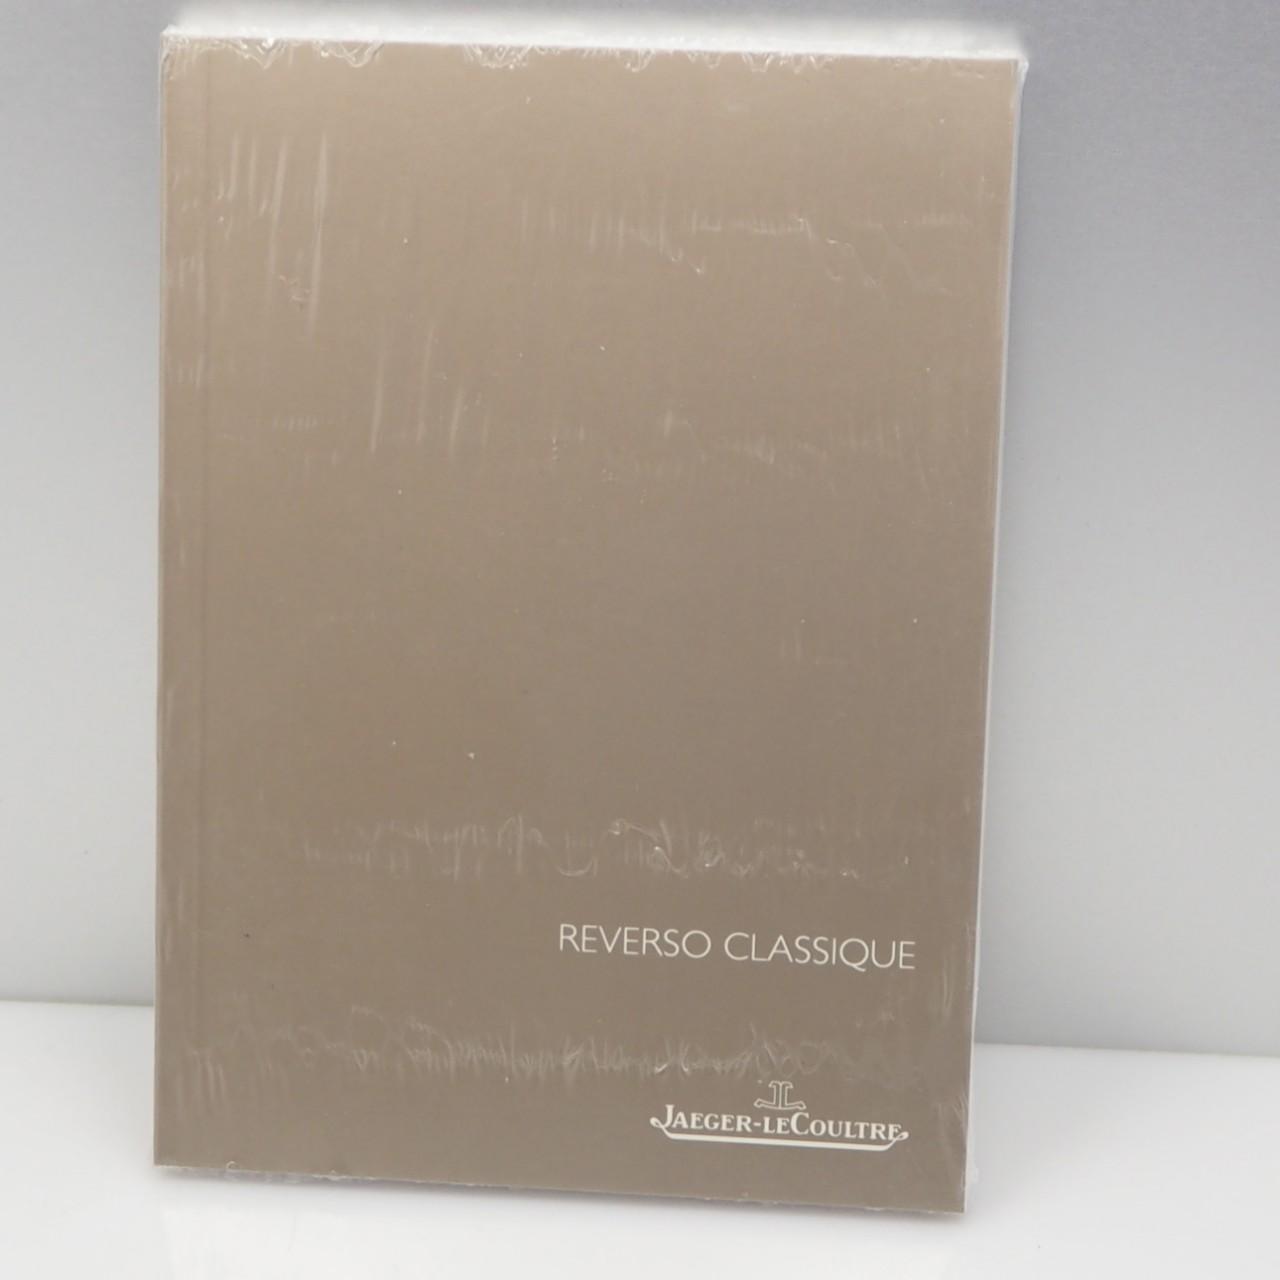 Jaeger LeCoultre Reverso Classique -Beschreibung / Instruction booklet 10,5 x 14,5mm